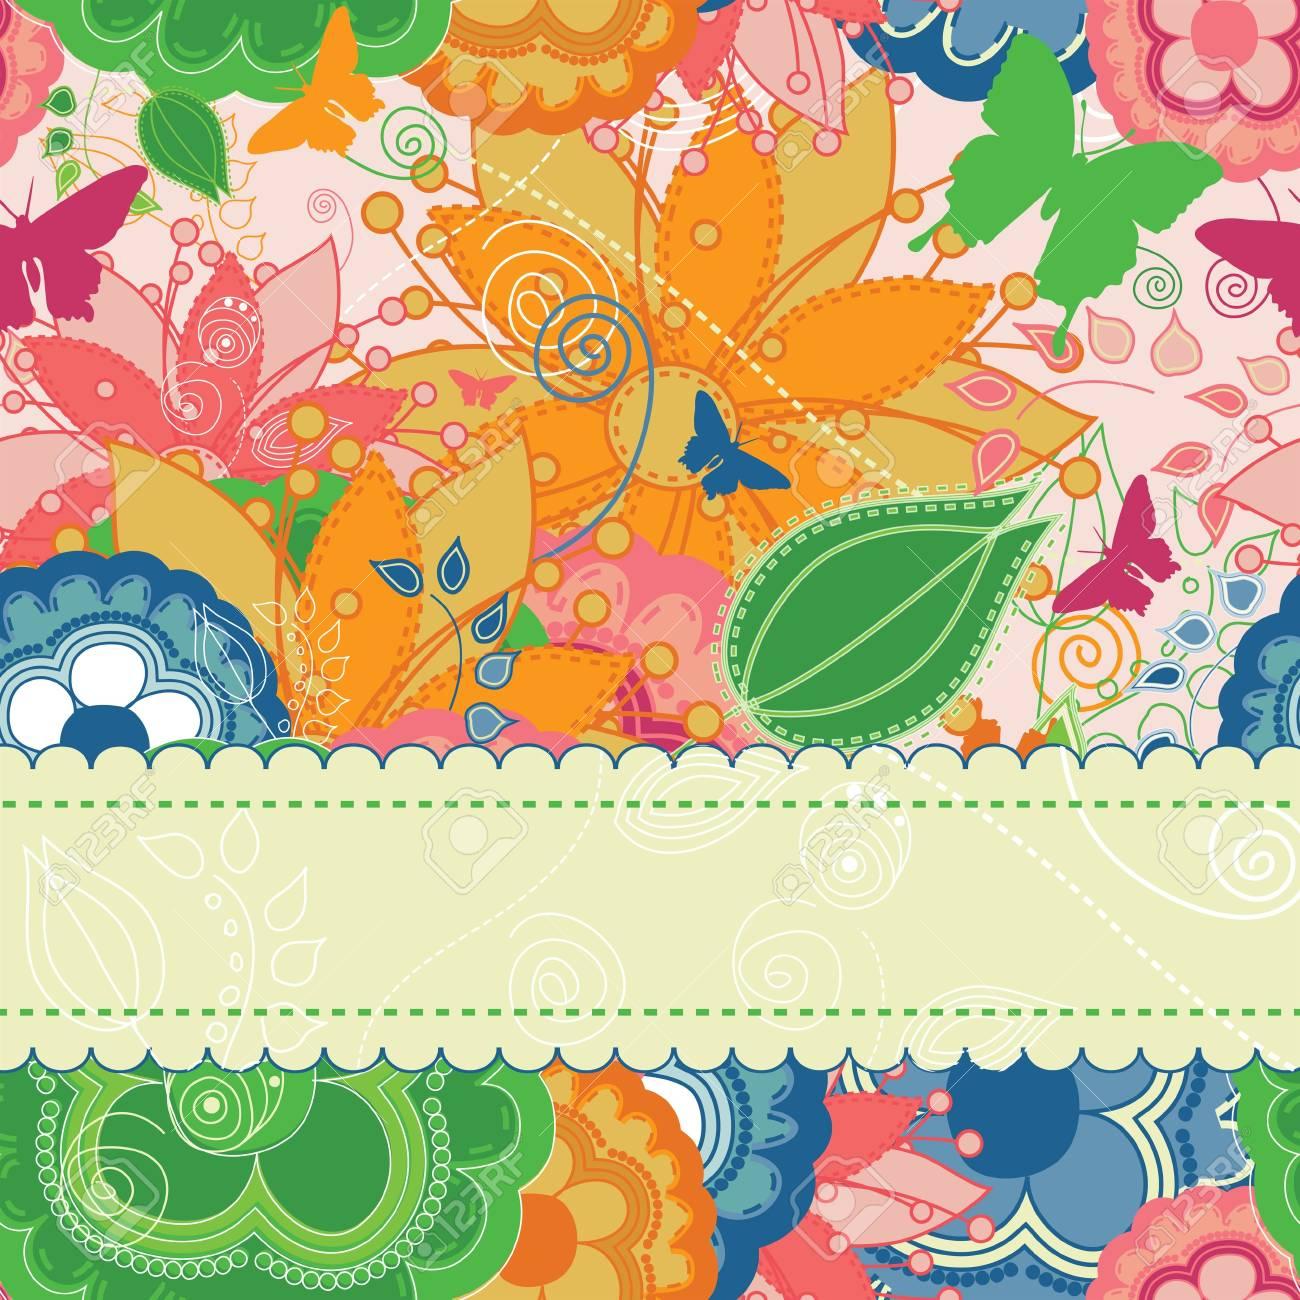 Elegant floral invitation or greeting card. Stock Vector - 7916053